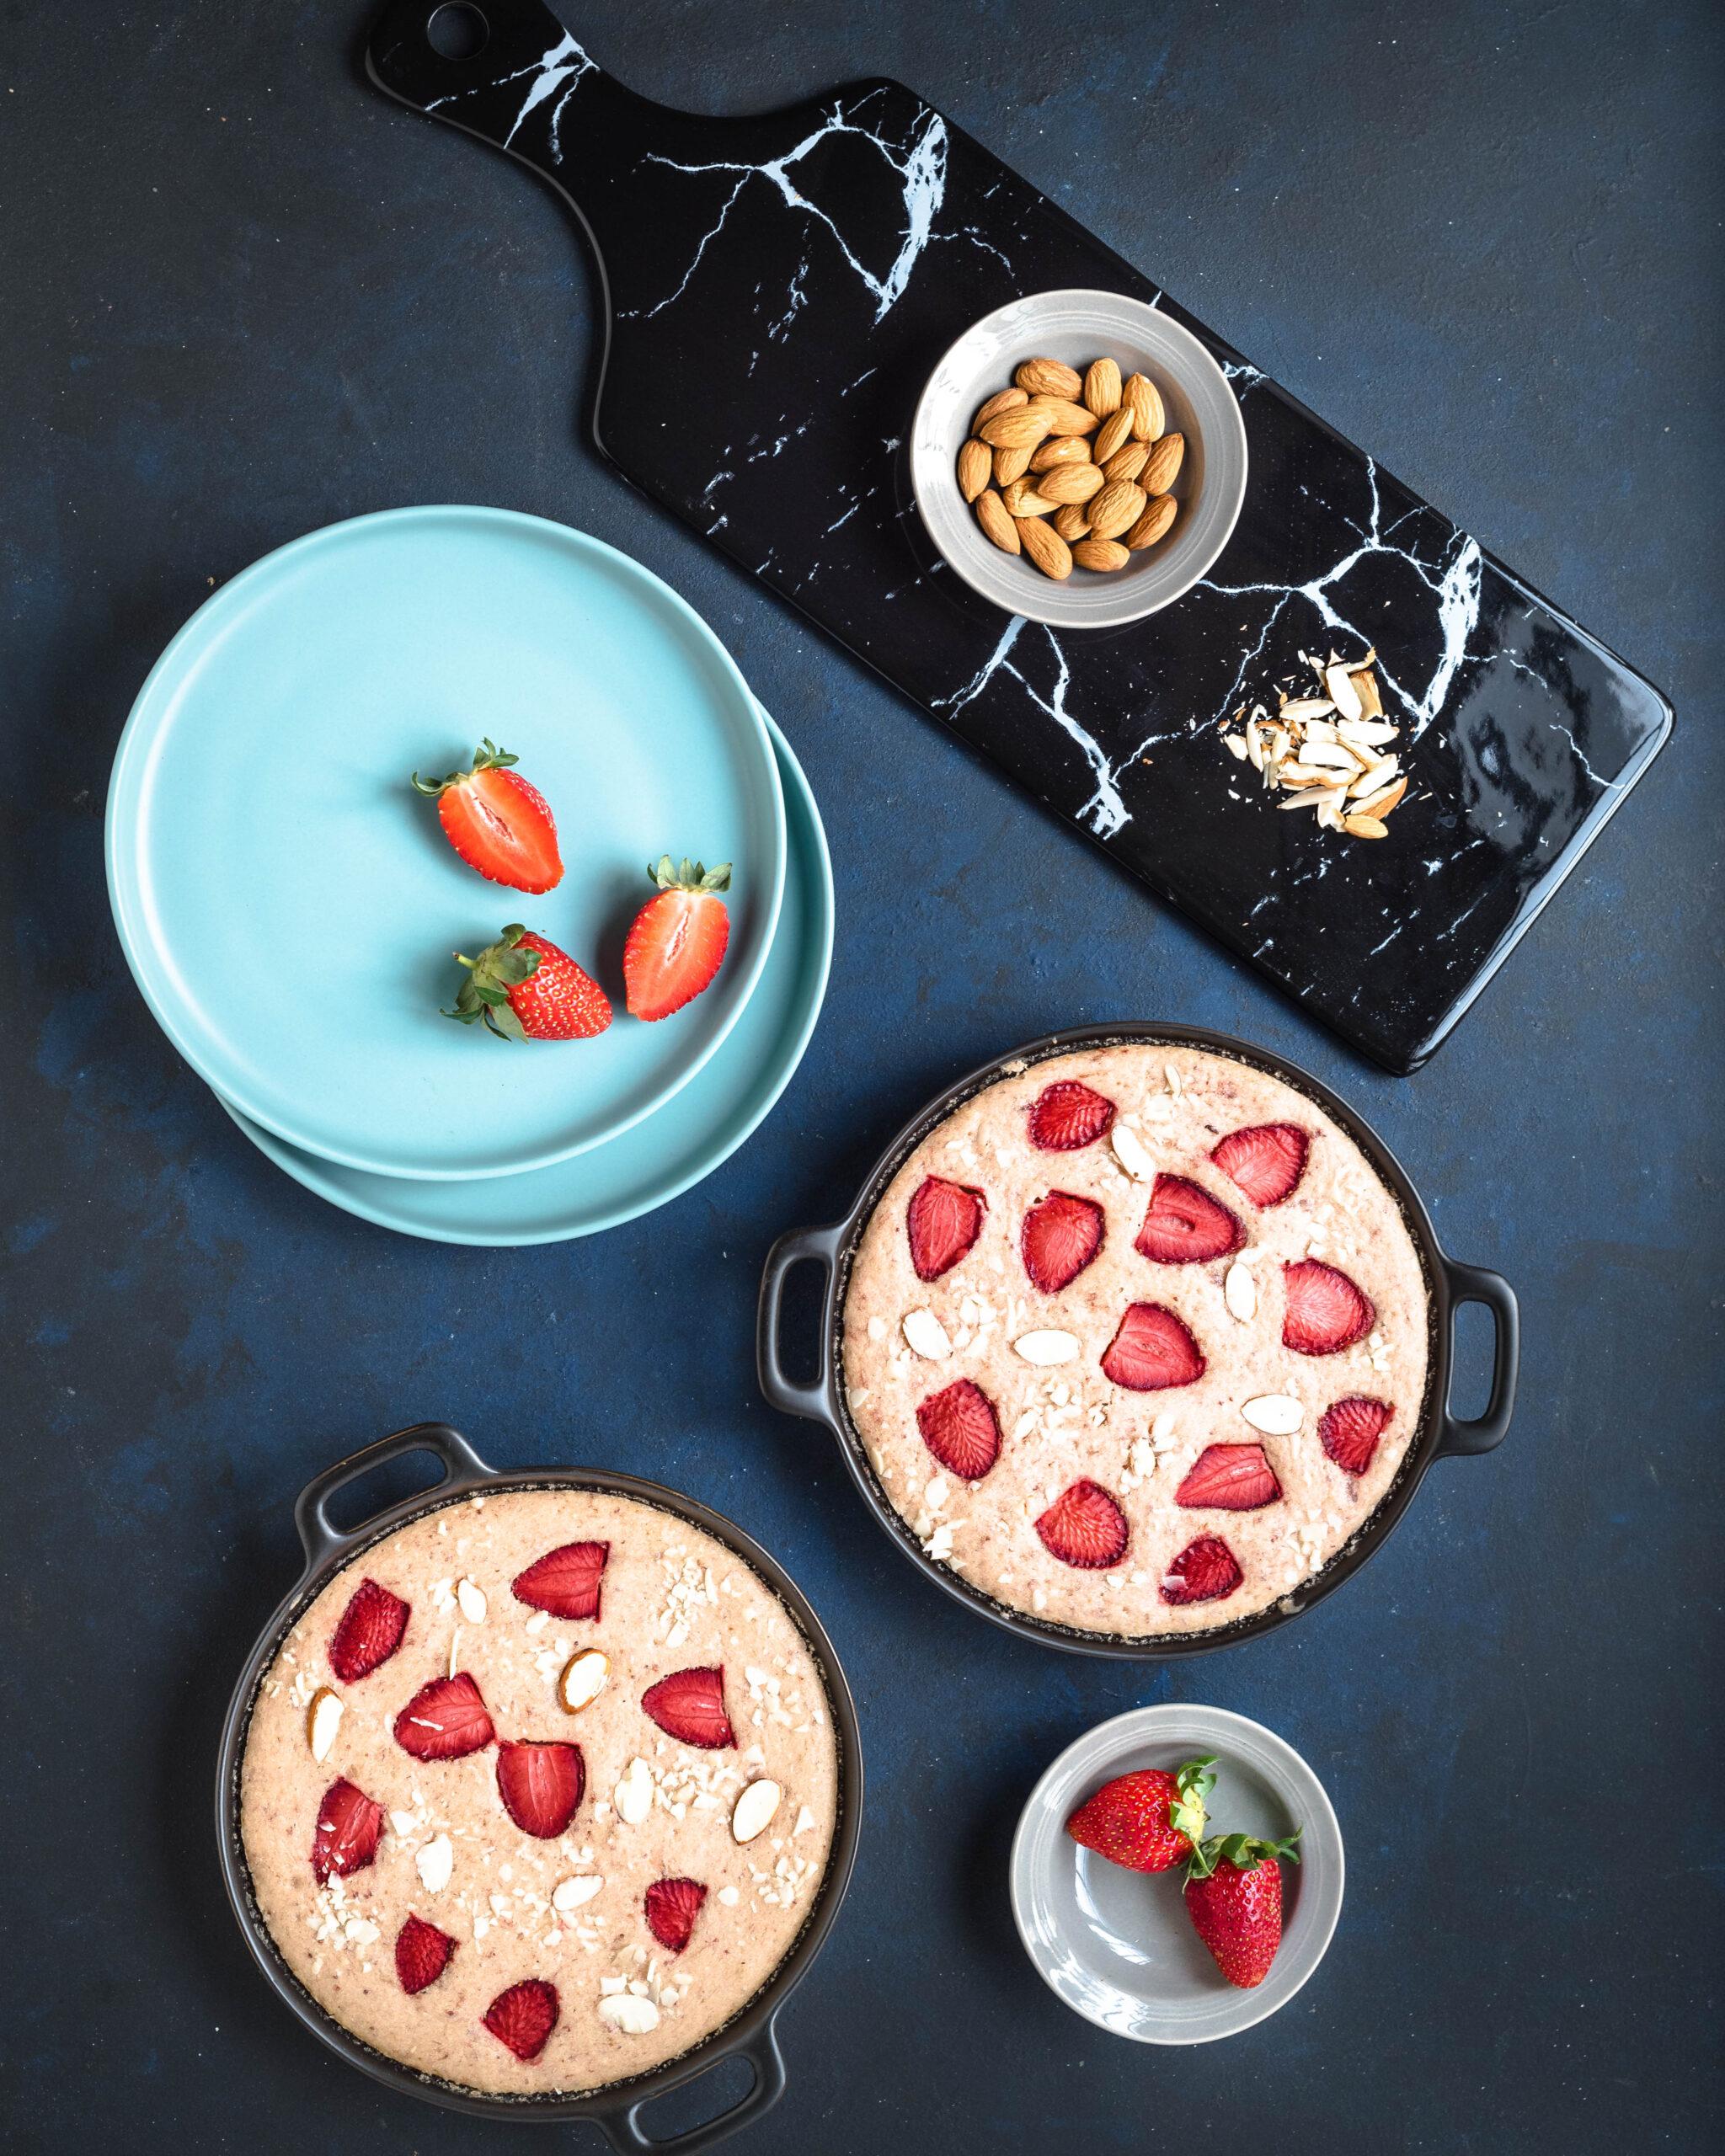 Strawberry bake-7181